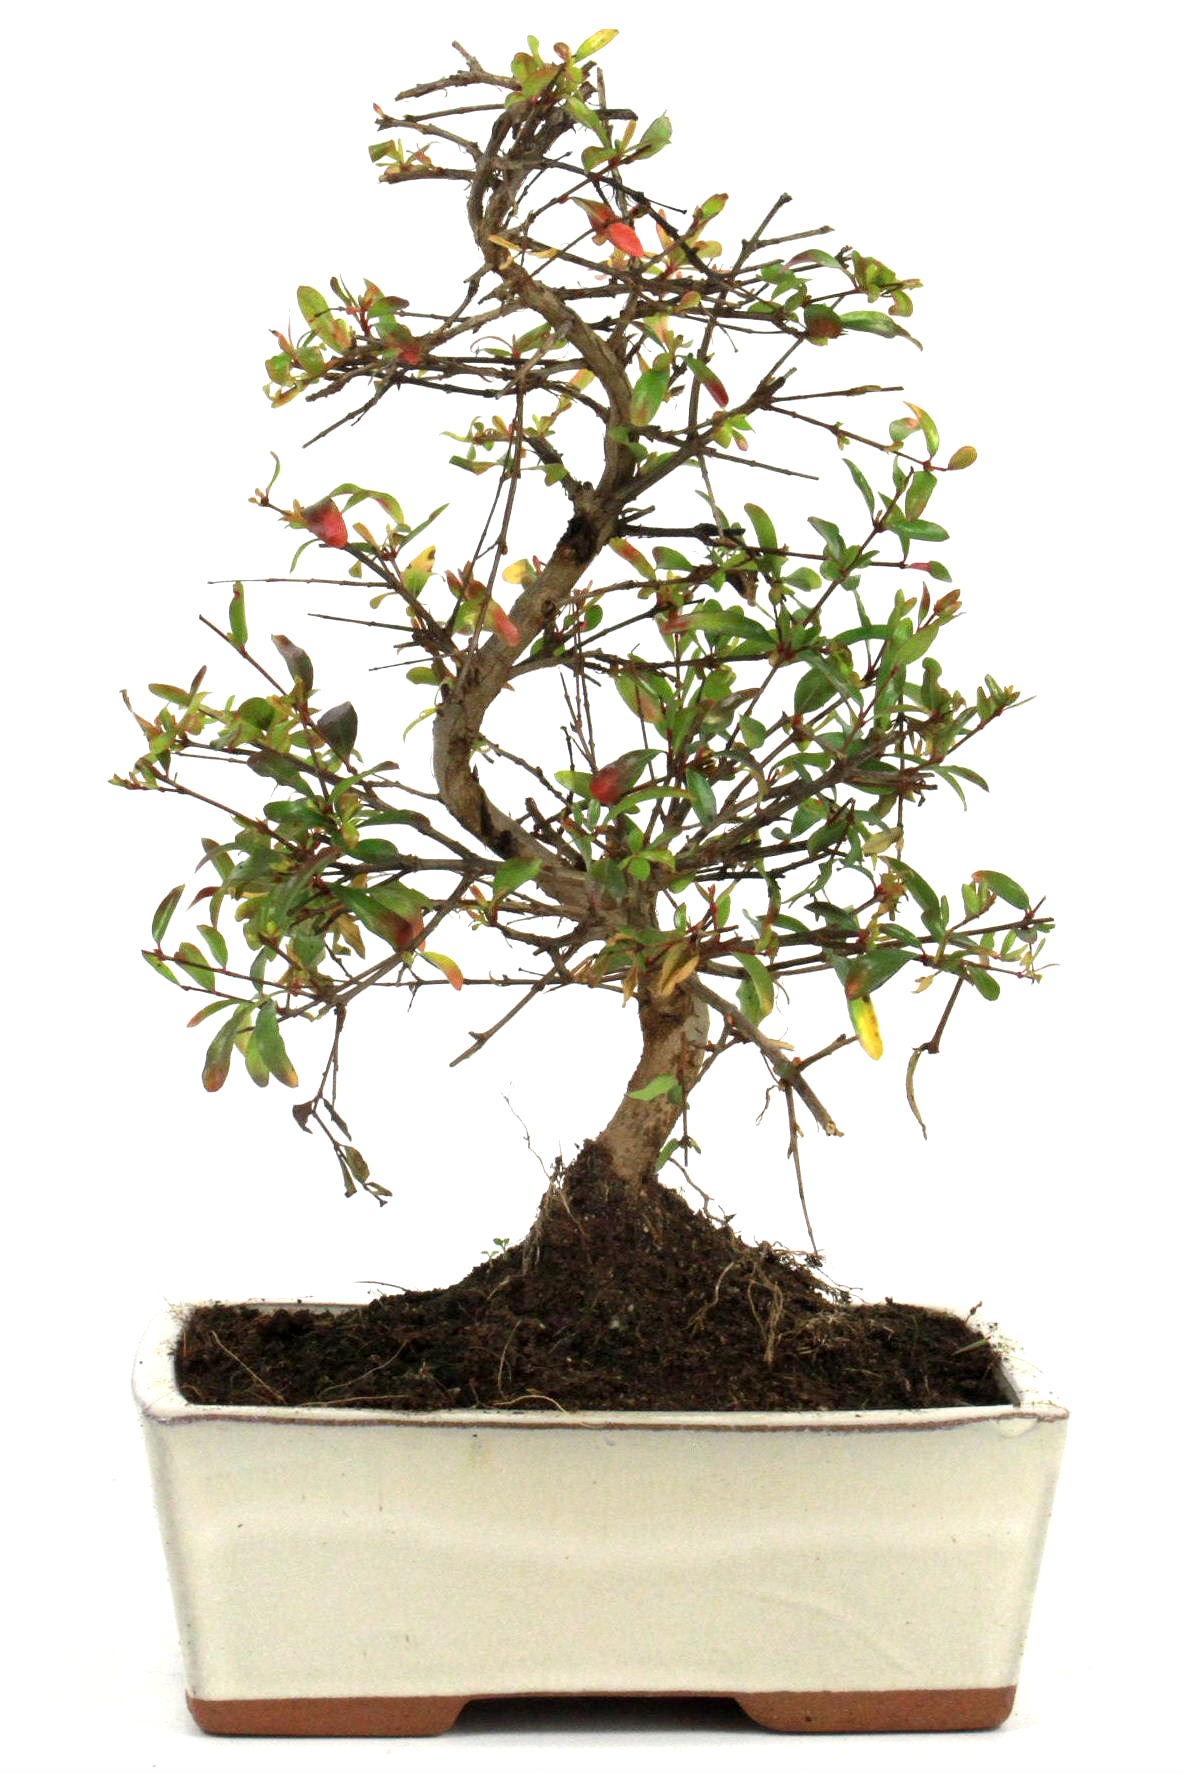 granatapfel bonsai 25 30 cm 1617 bei oyaki bonsai kaufen. Black Bedroom Furniture Sets. Home Design Ideas